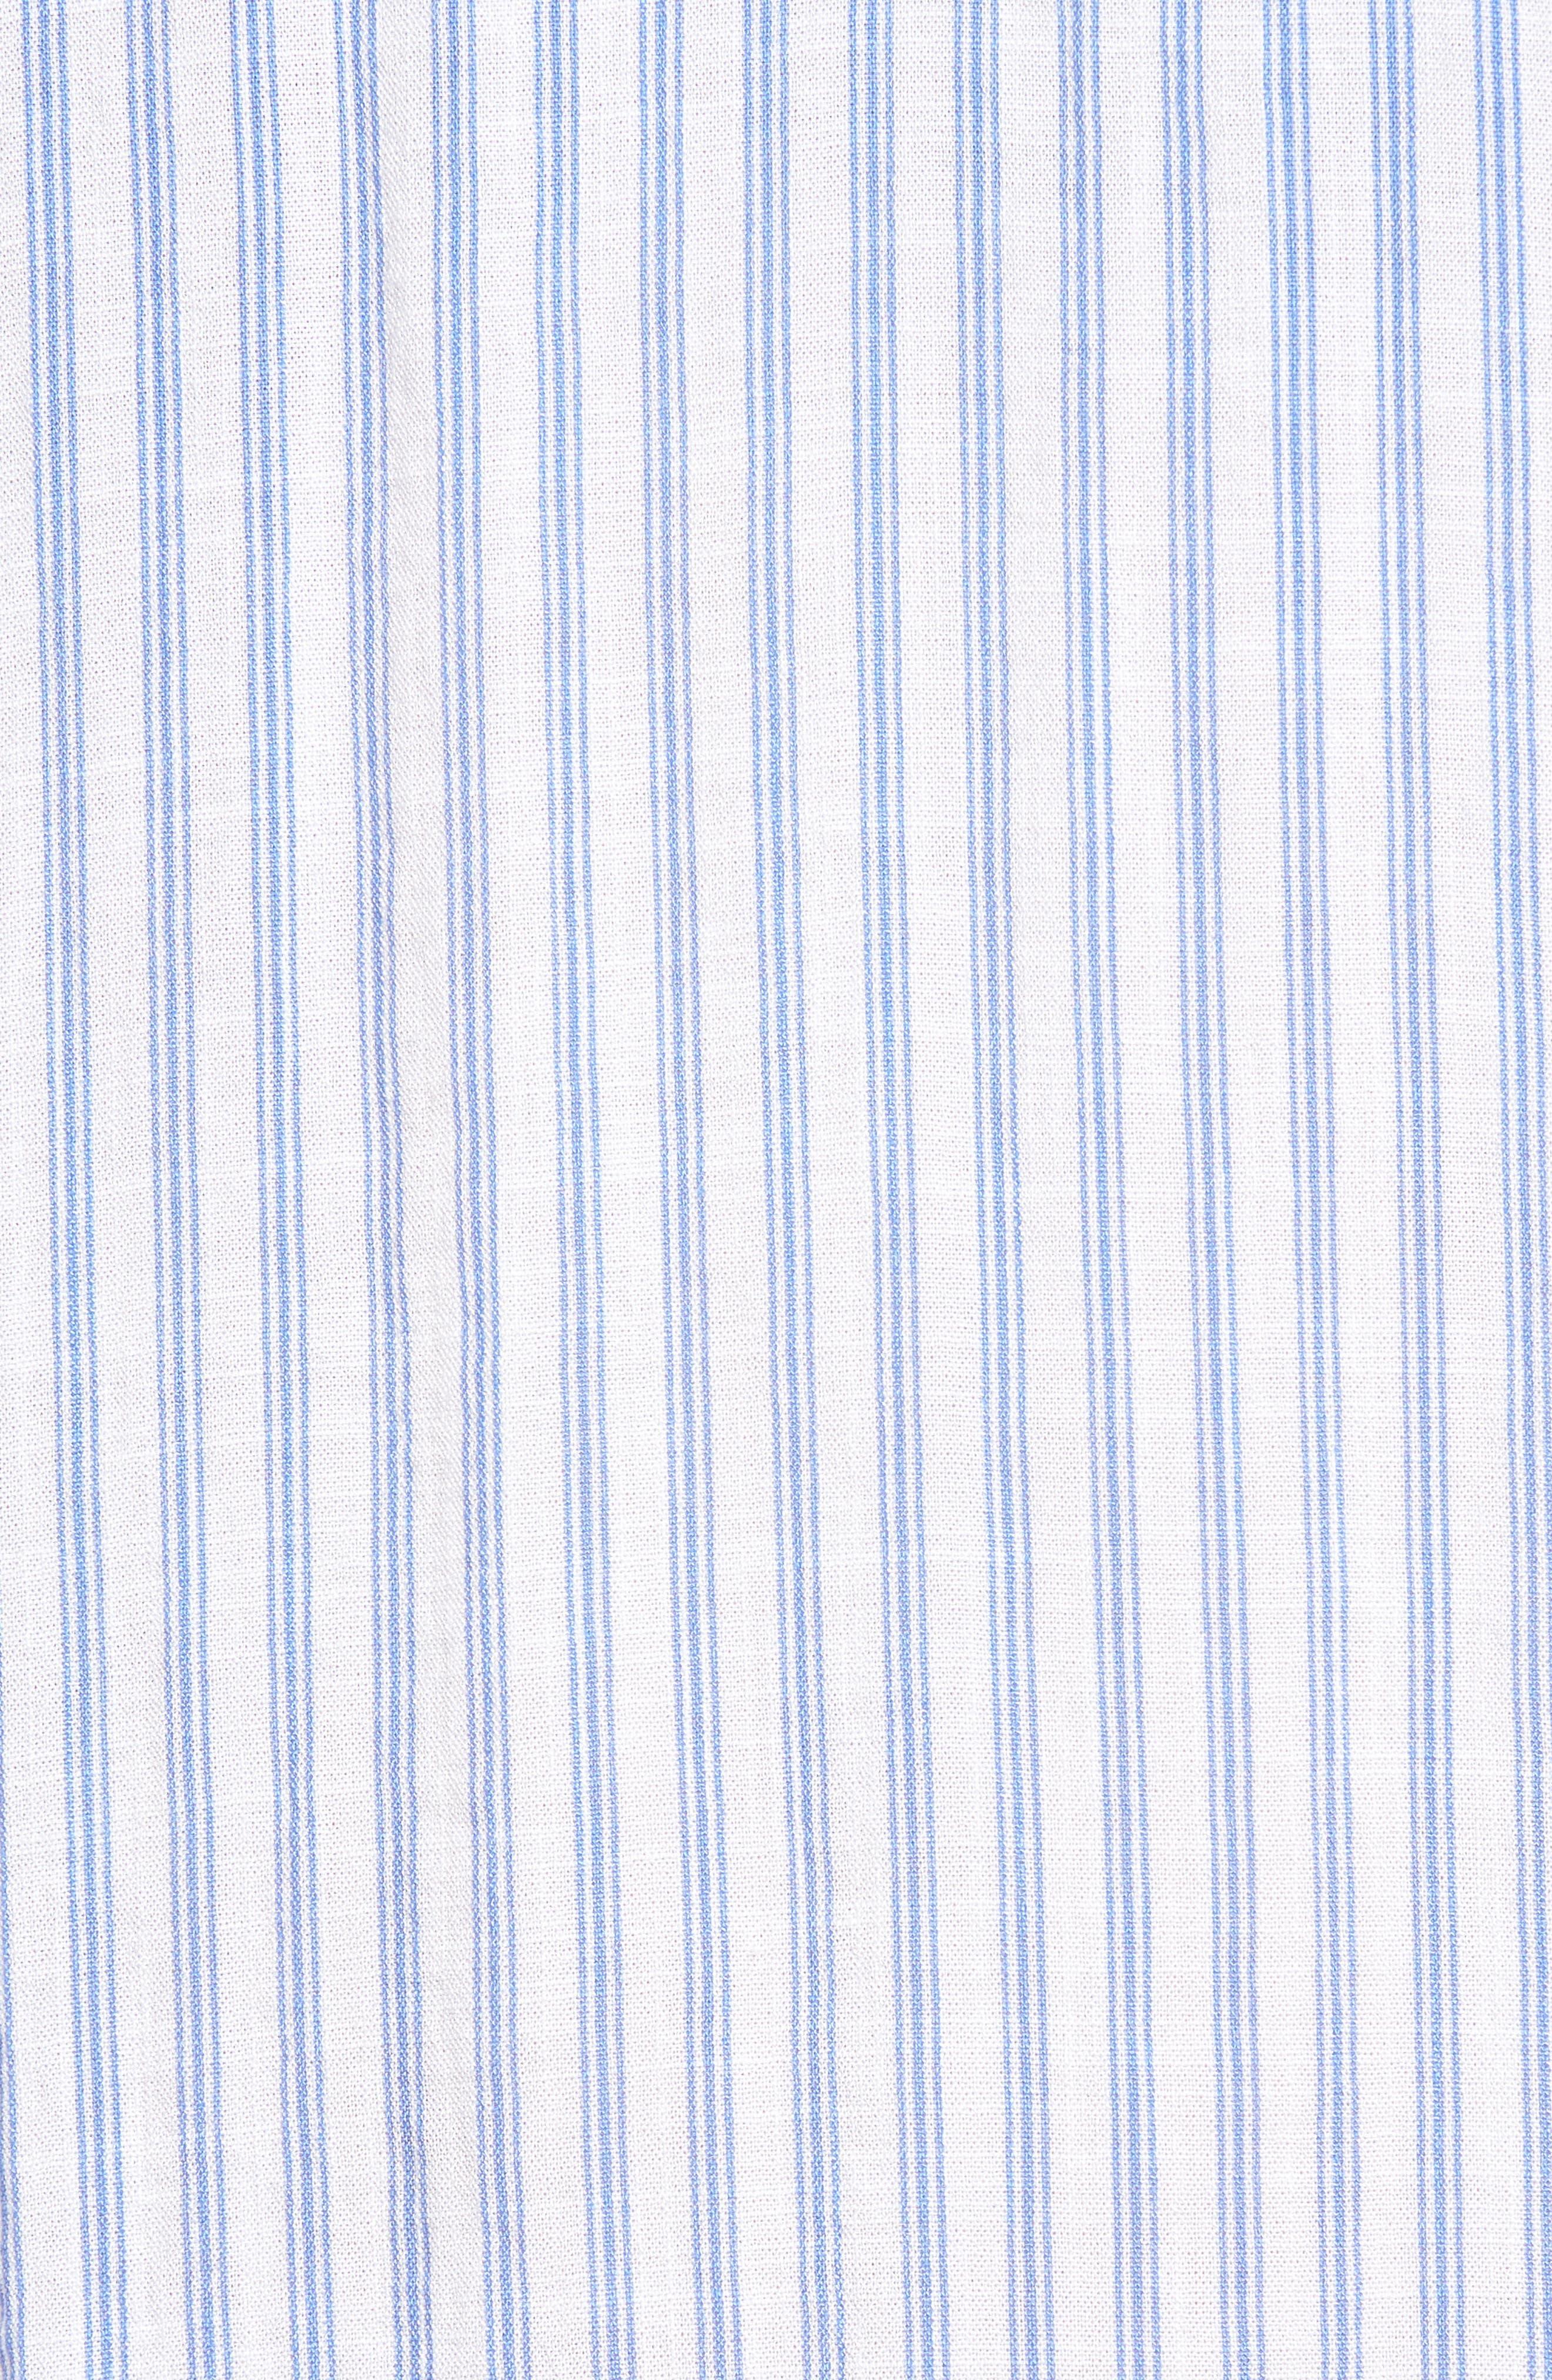 Bishop + Young Stripe Tunic Top,                             Alternate thumbnail 6, color,                             Blue White Stripe